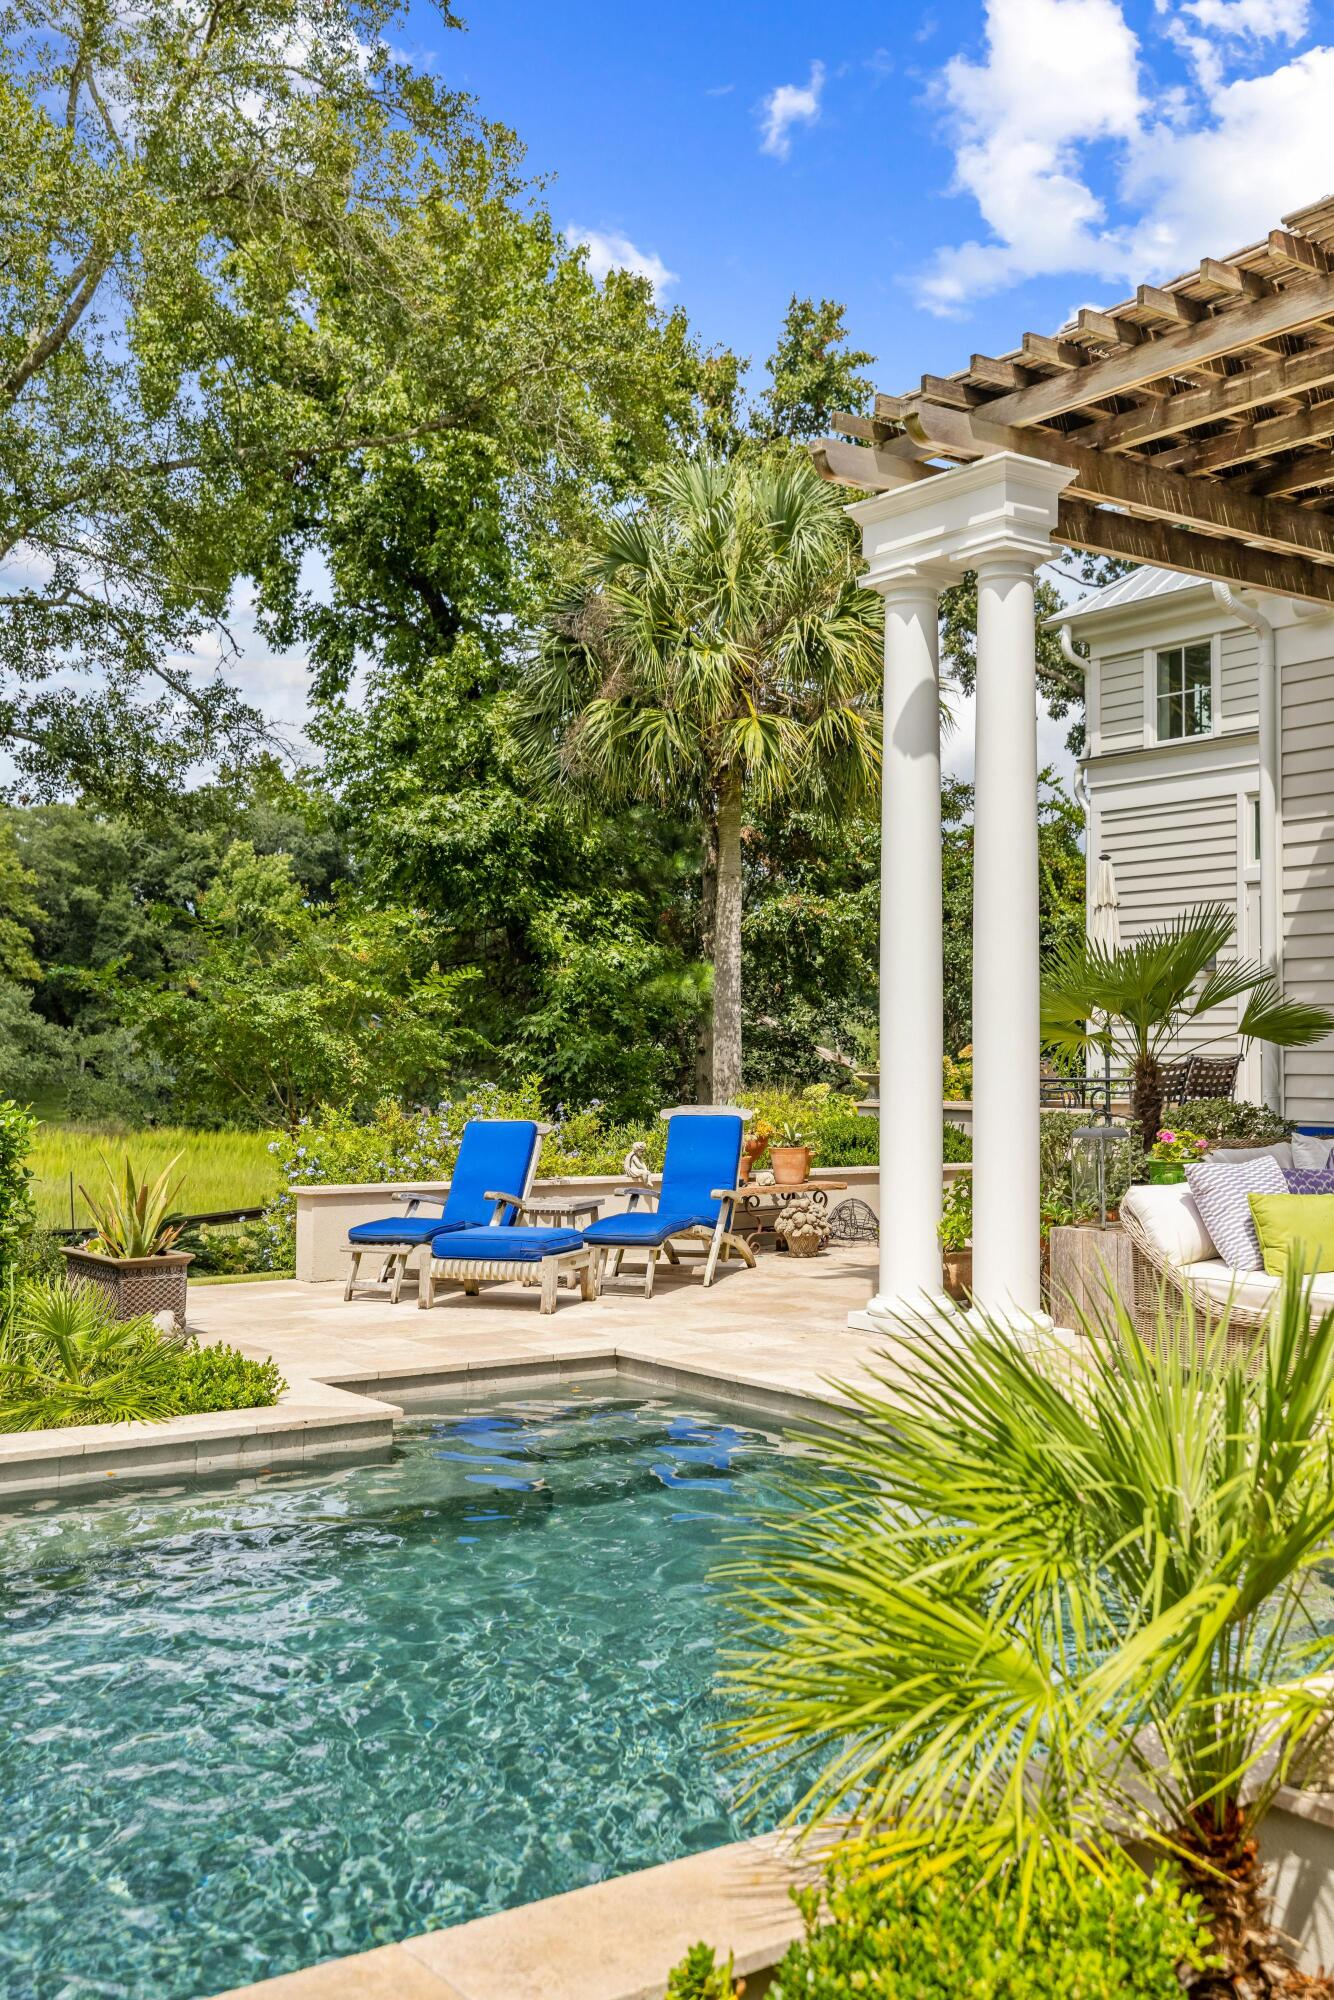 Molasses Creek Homes For Sale - 380 Overseer, Mount Pleasant, SC - 6